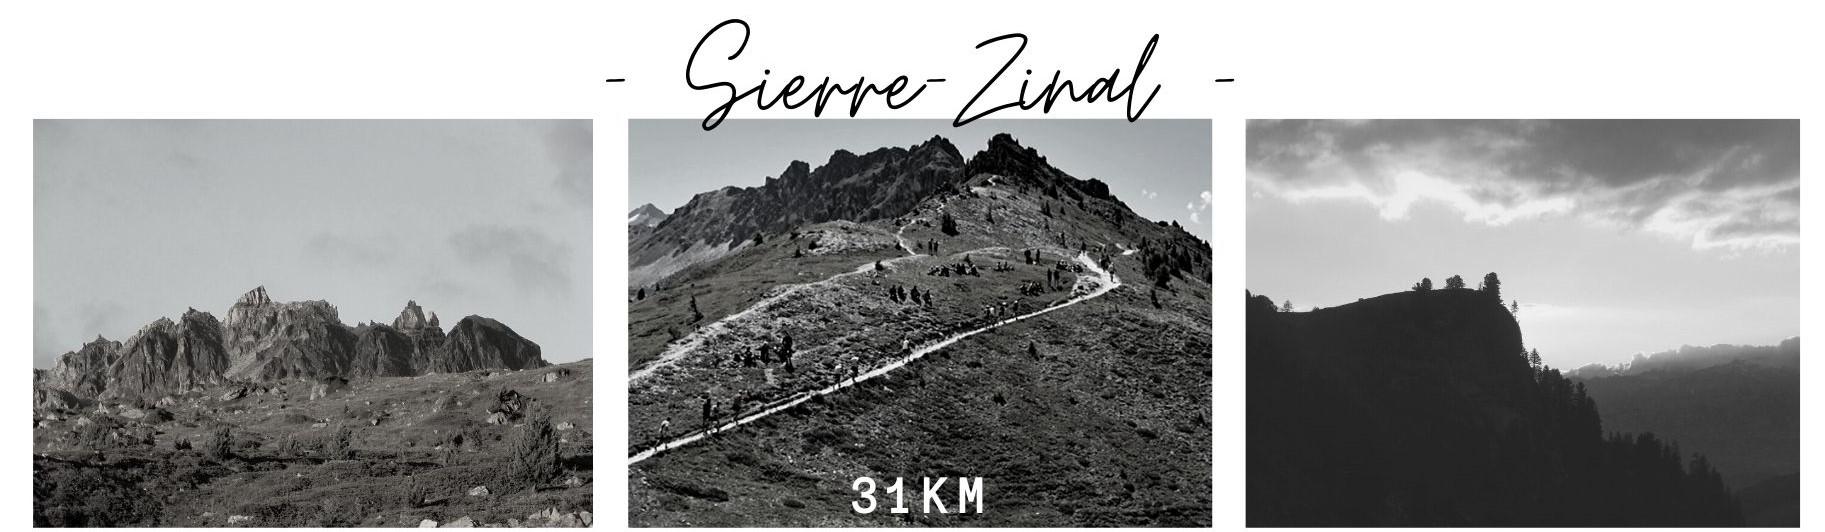 sierre zinal trail running